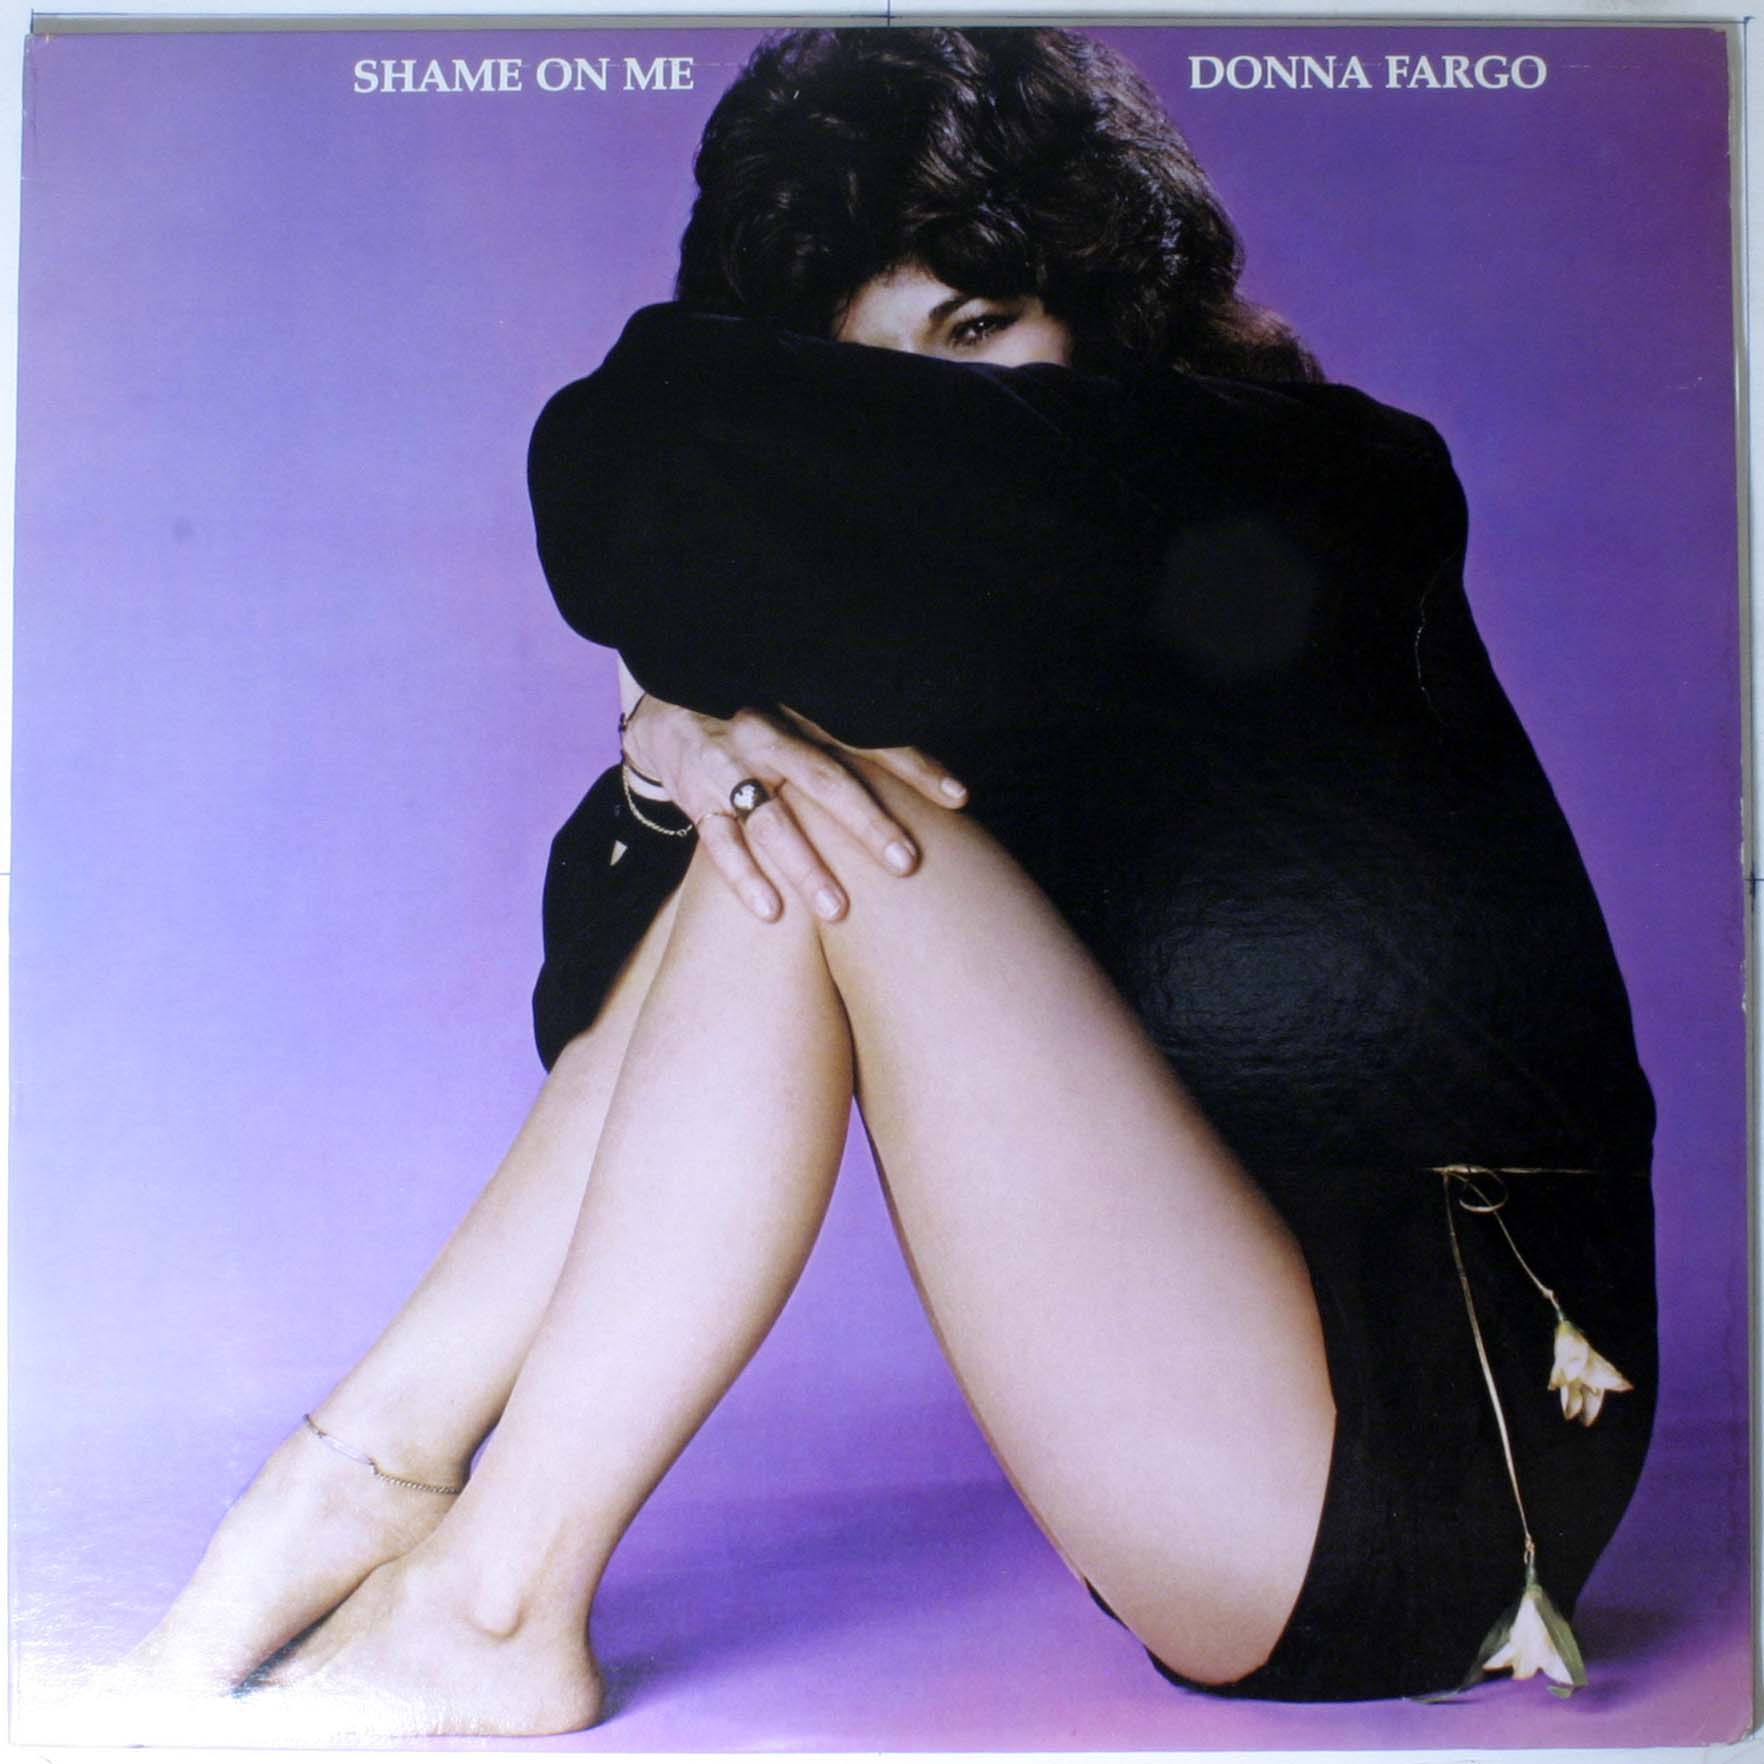 Shame On Me - Donna Fargo